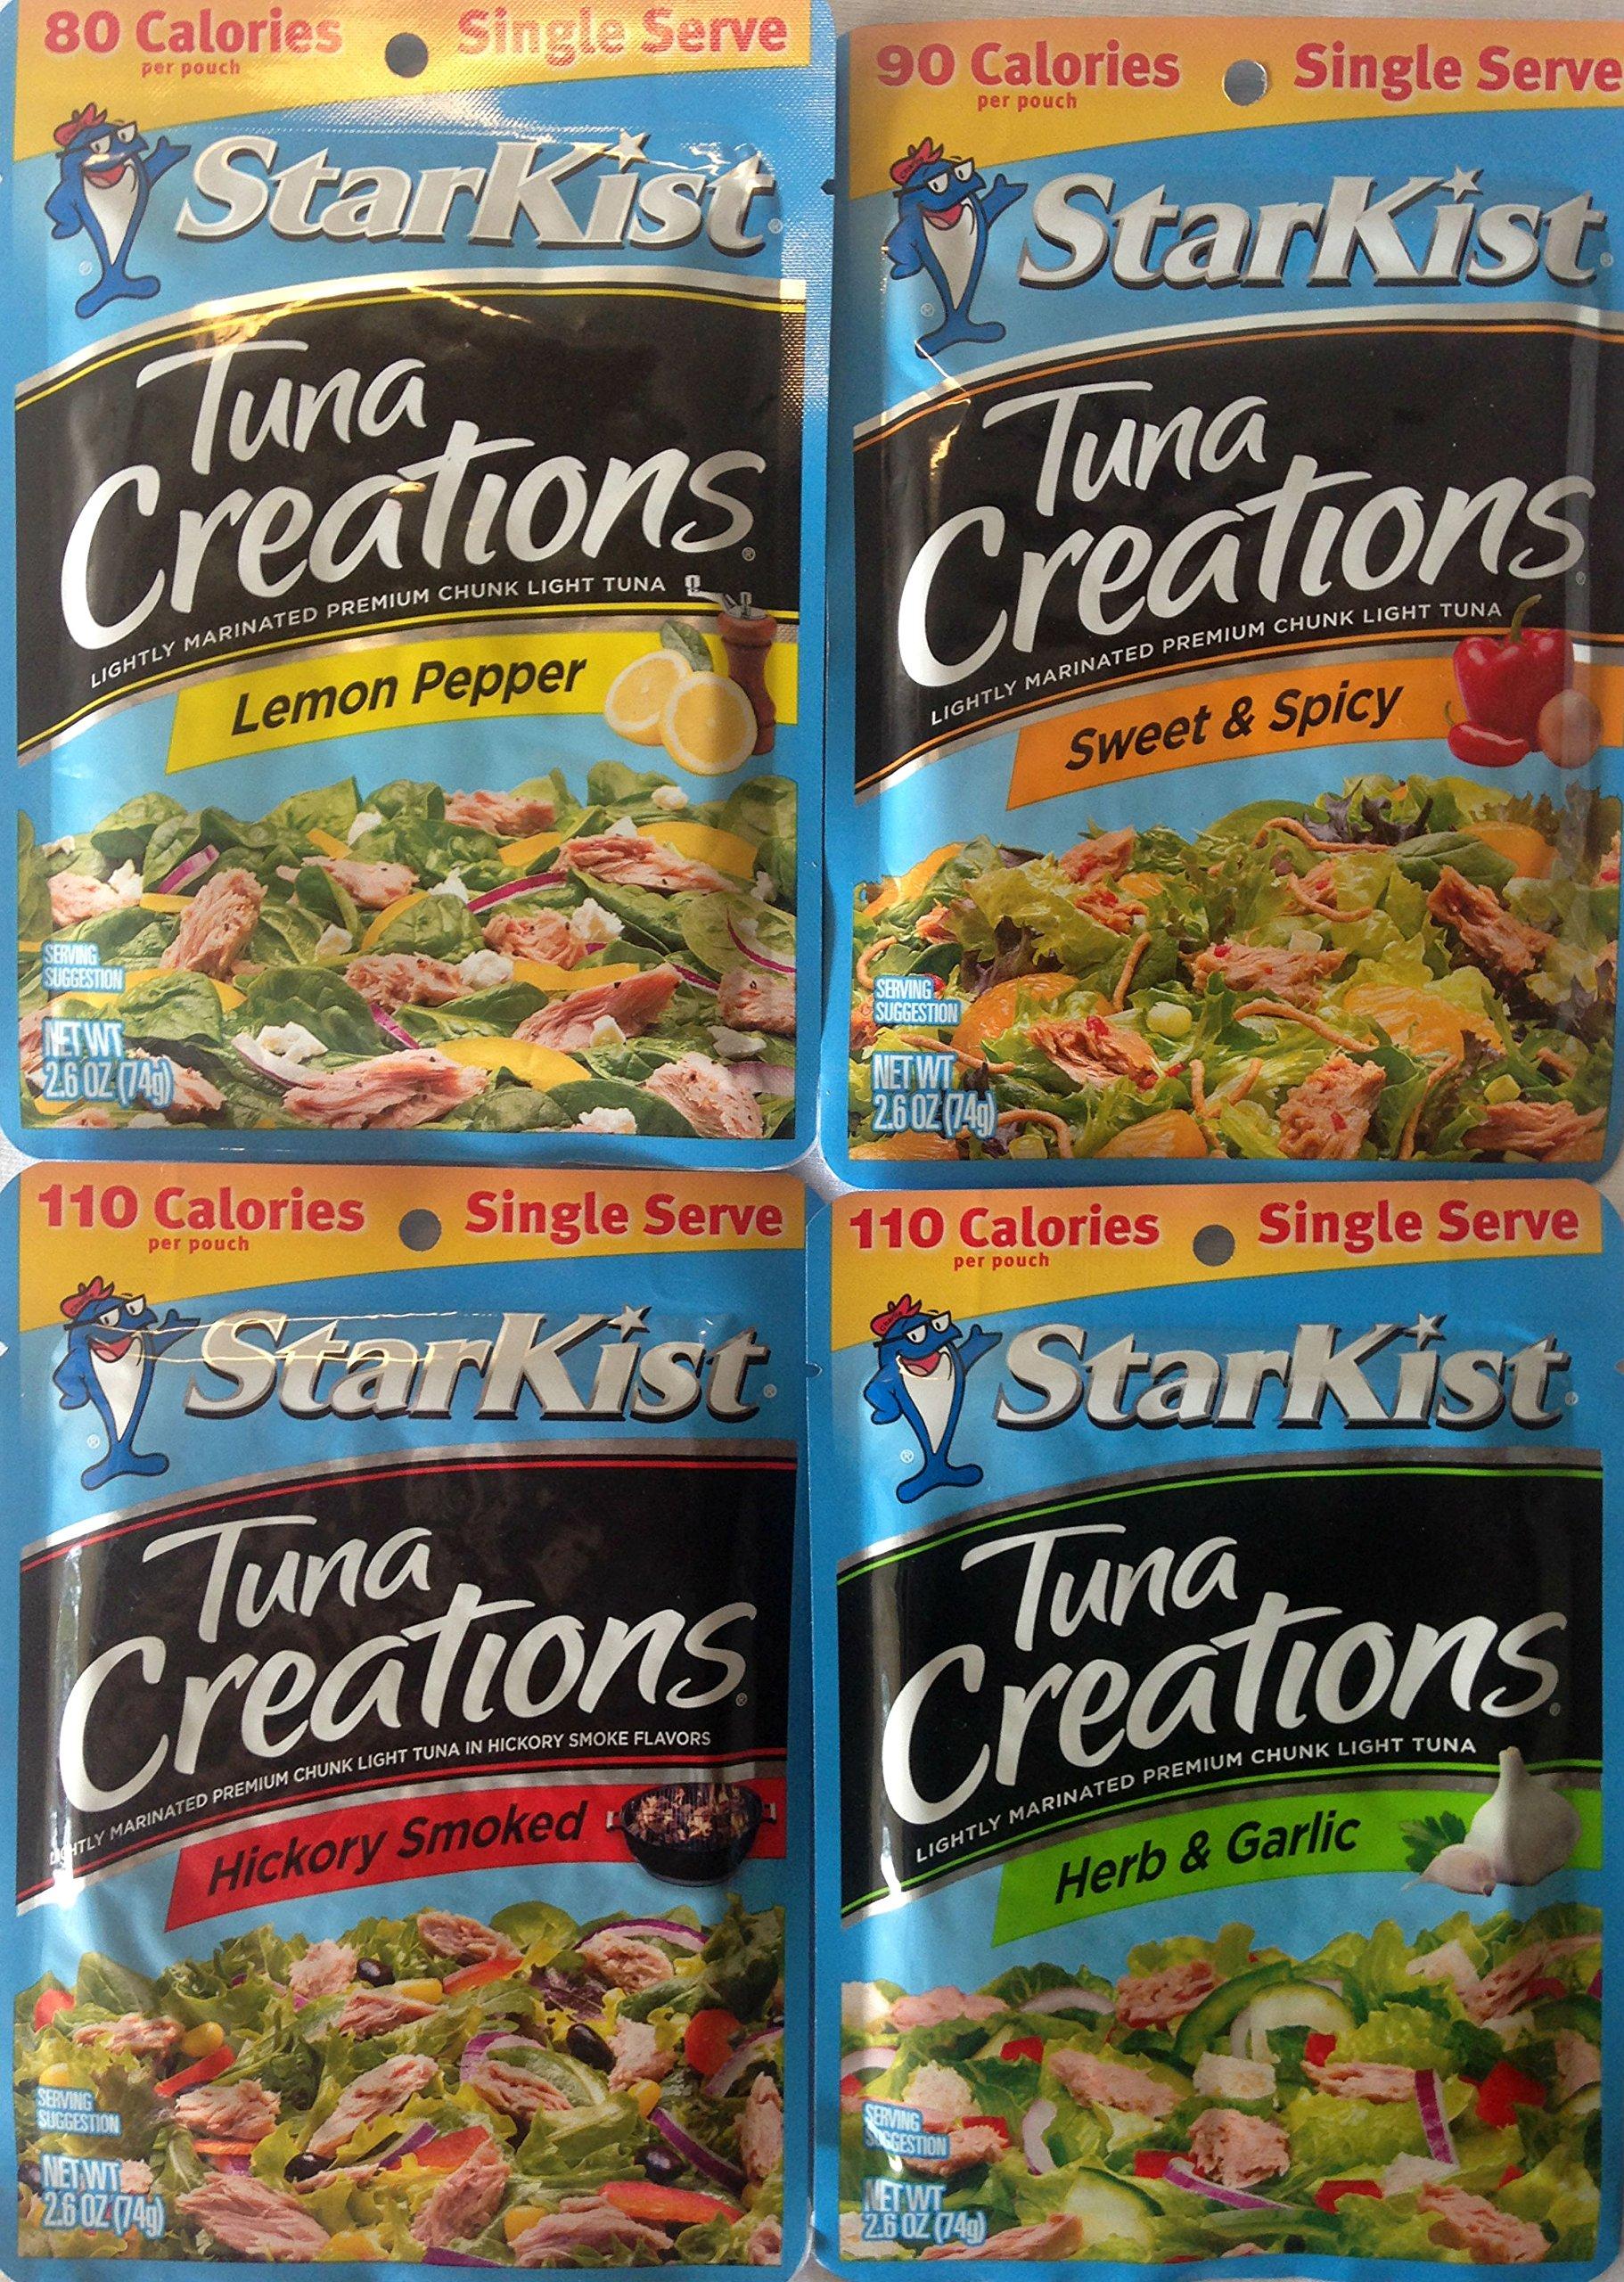 Starkist Tuna Creations - Variety Pack; Hickory Smoked, Herb & Garlic, Lemon Pepper, Sweet & Spicy (Pack of 4)